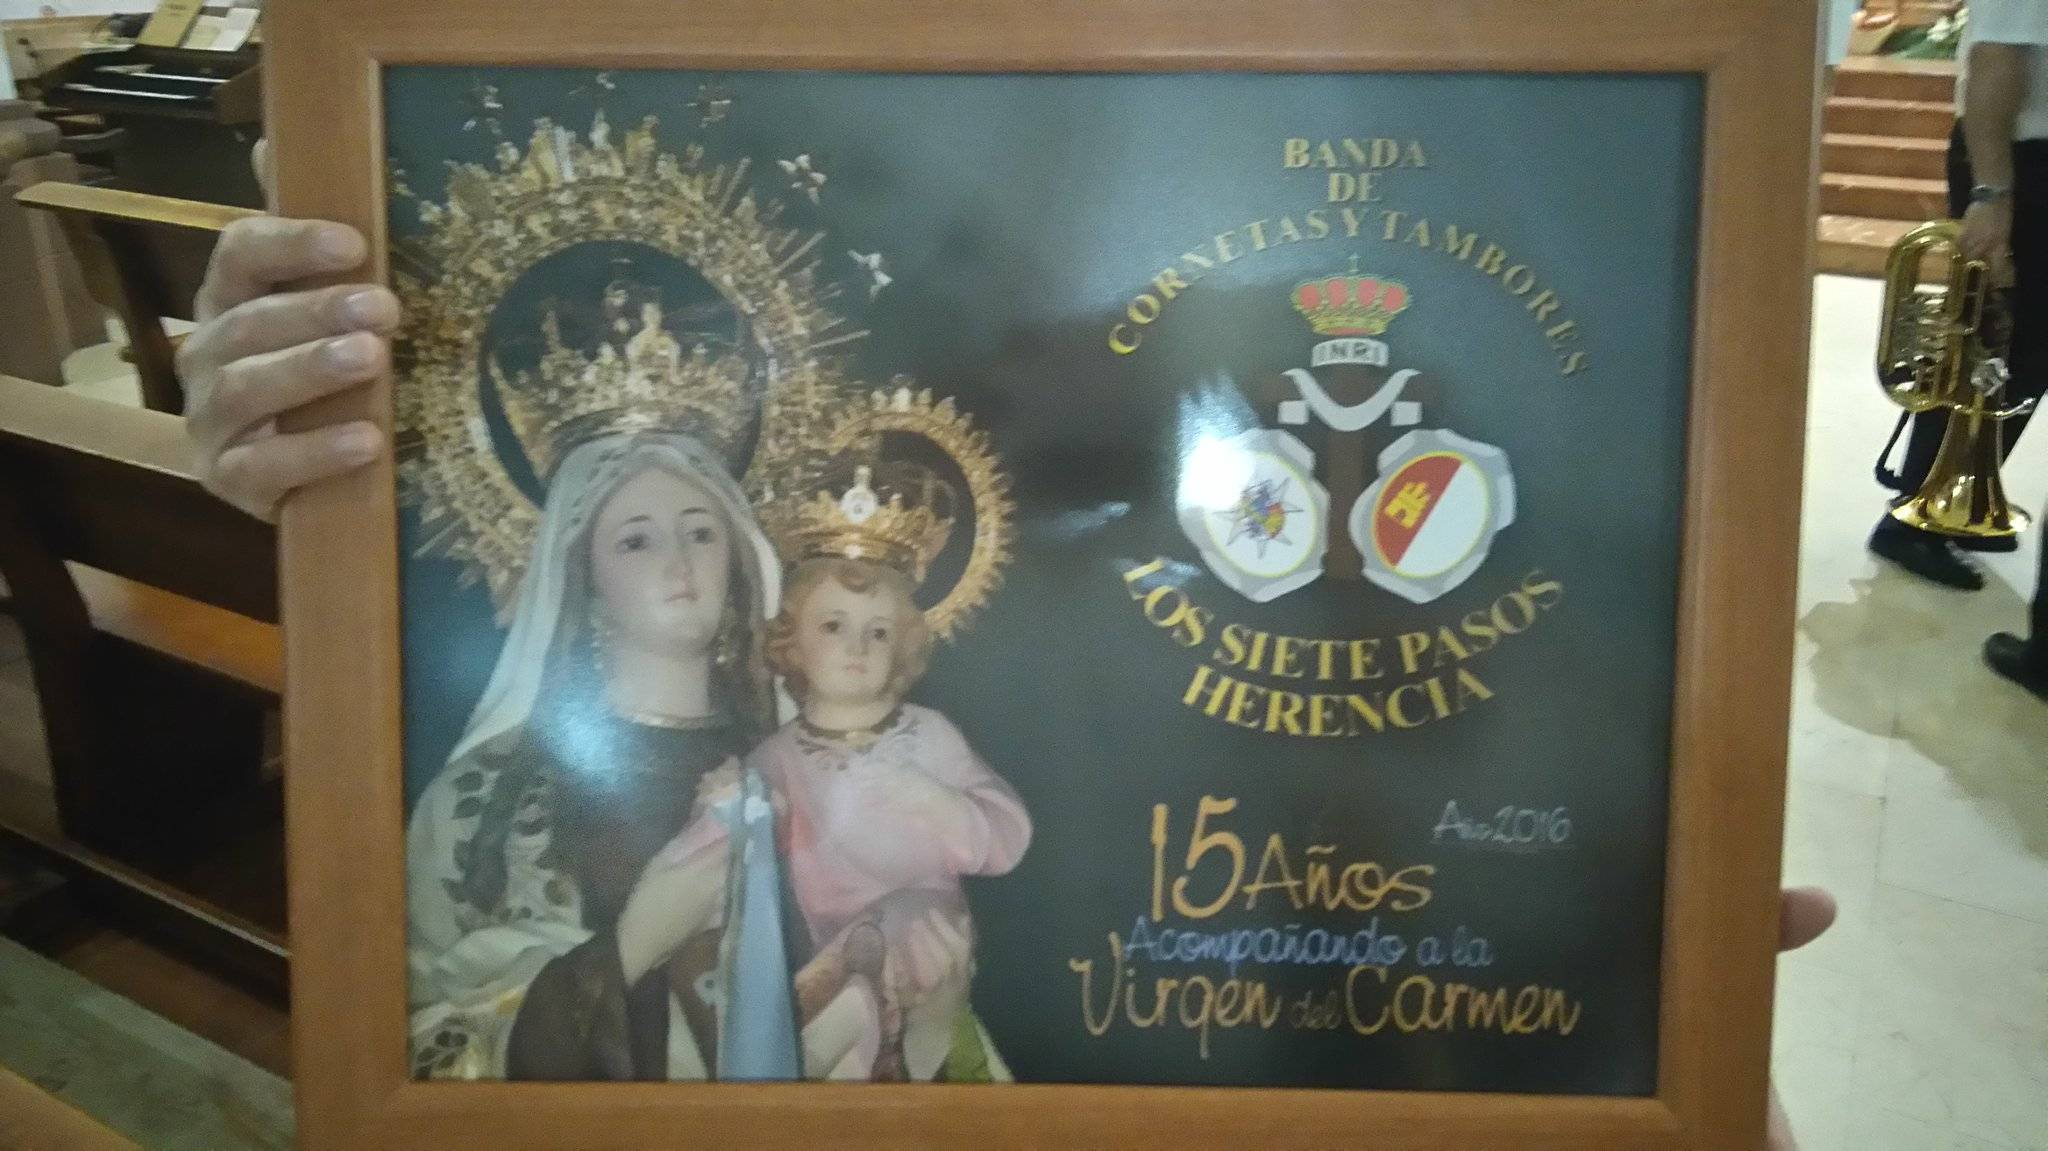 15 anos con la virgen del carmen - Banda Siete Pasos: 15 años acompañando a la Virgen del Carmen